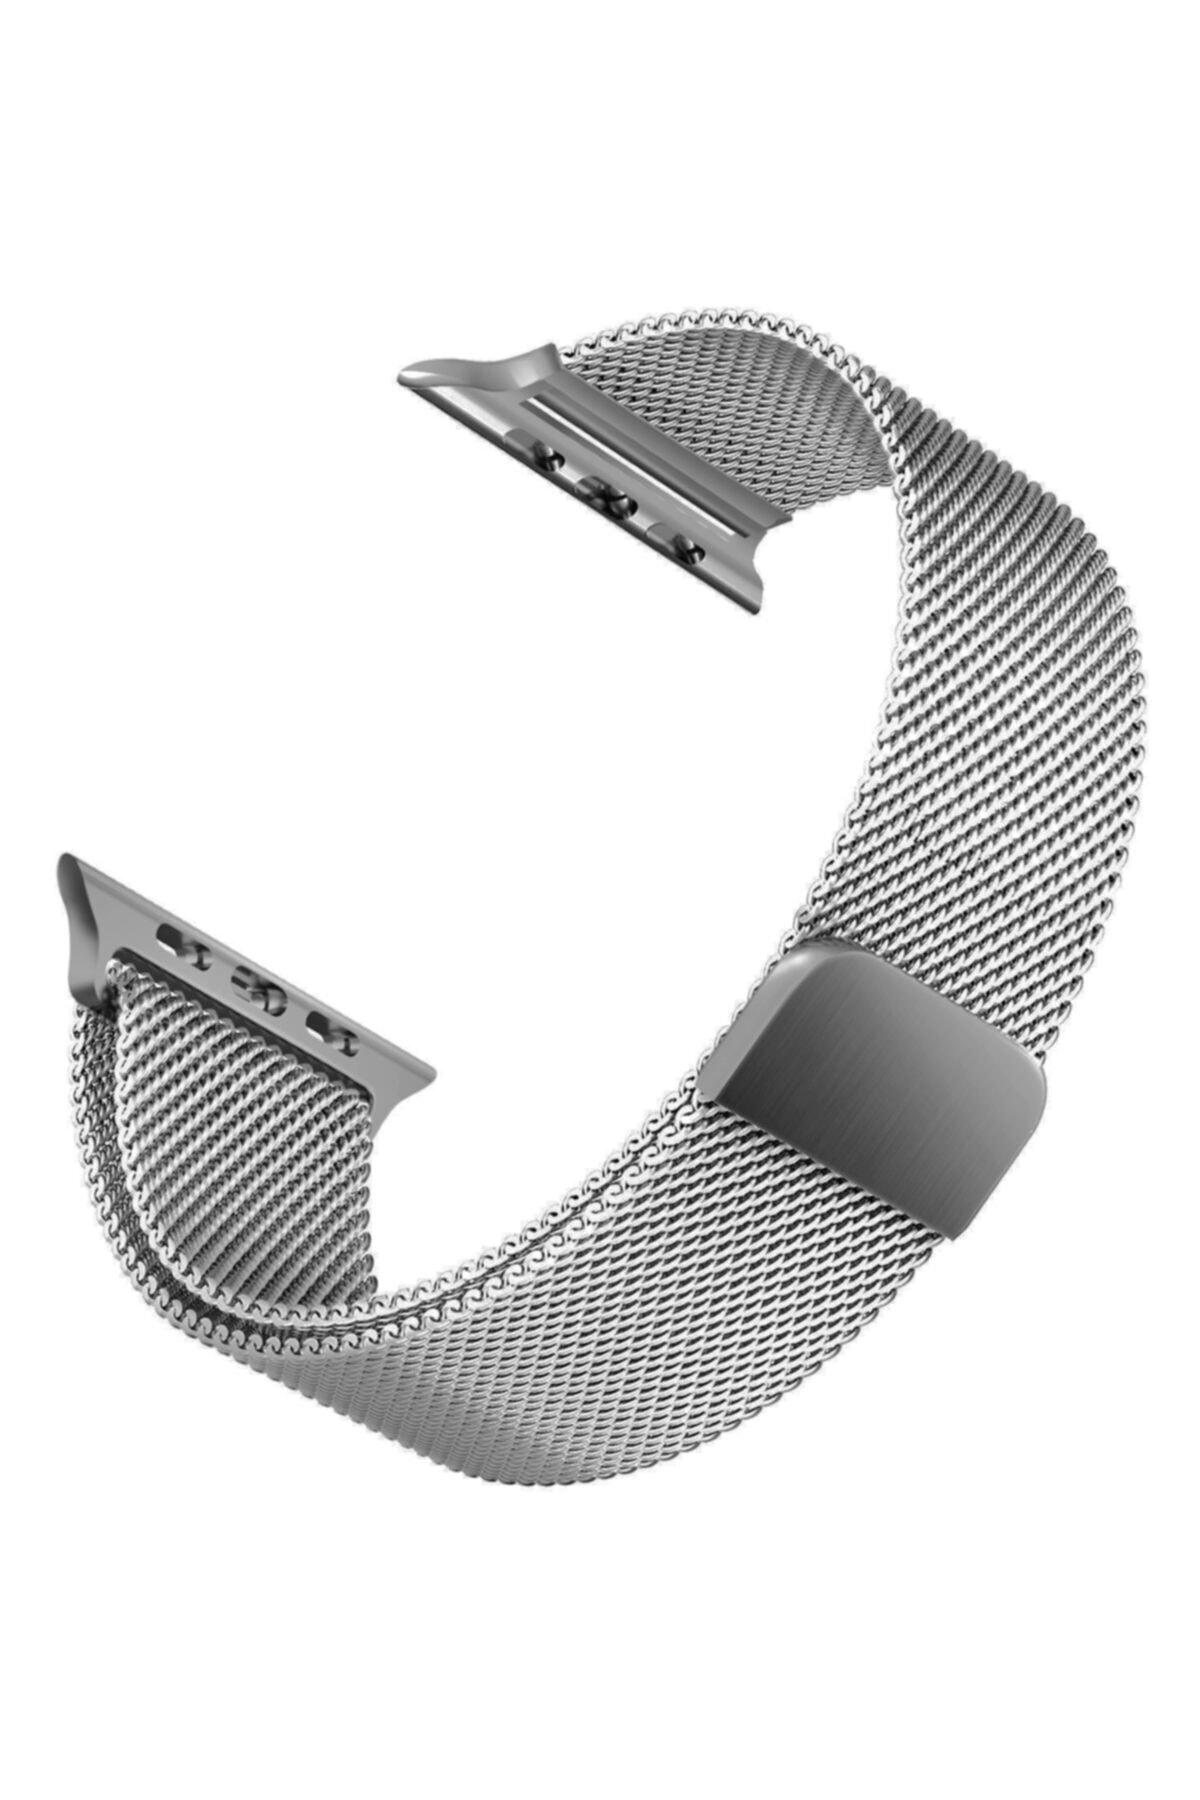 Microsonic Microsonic Watch 1 38mm Milanese Loop Kordon Gümüş 1